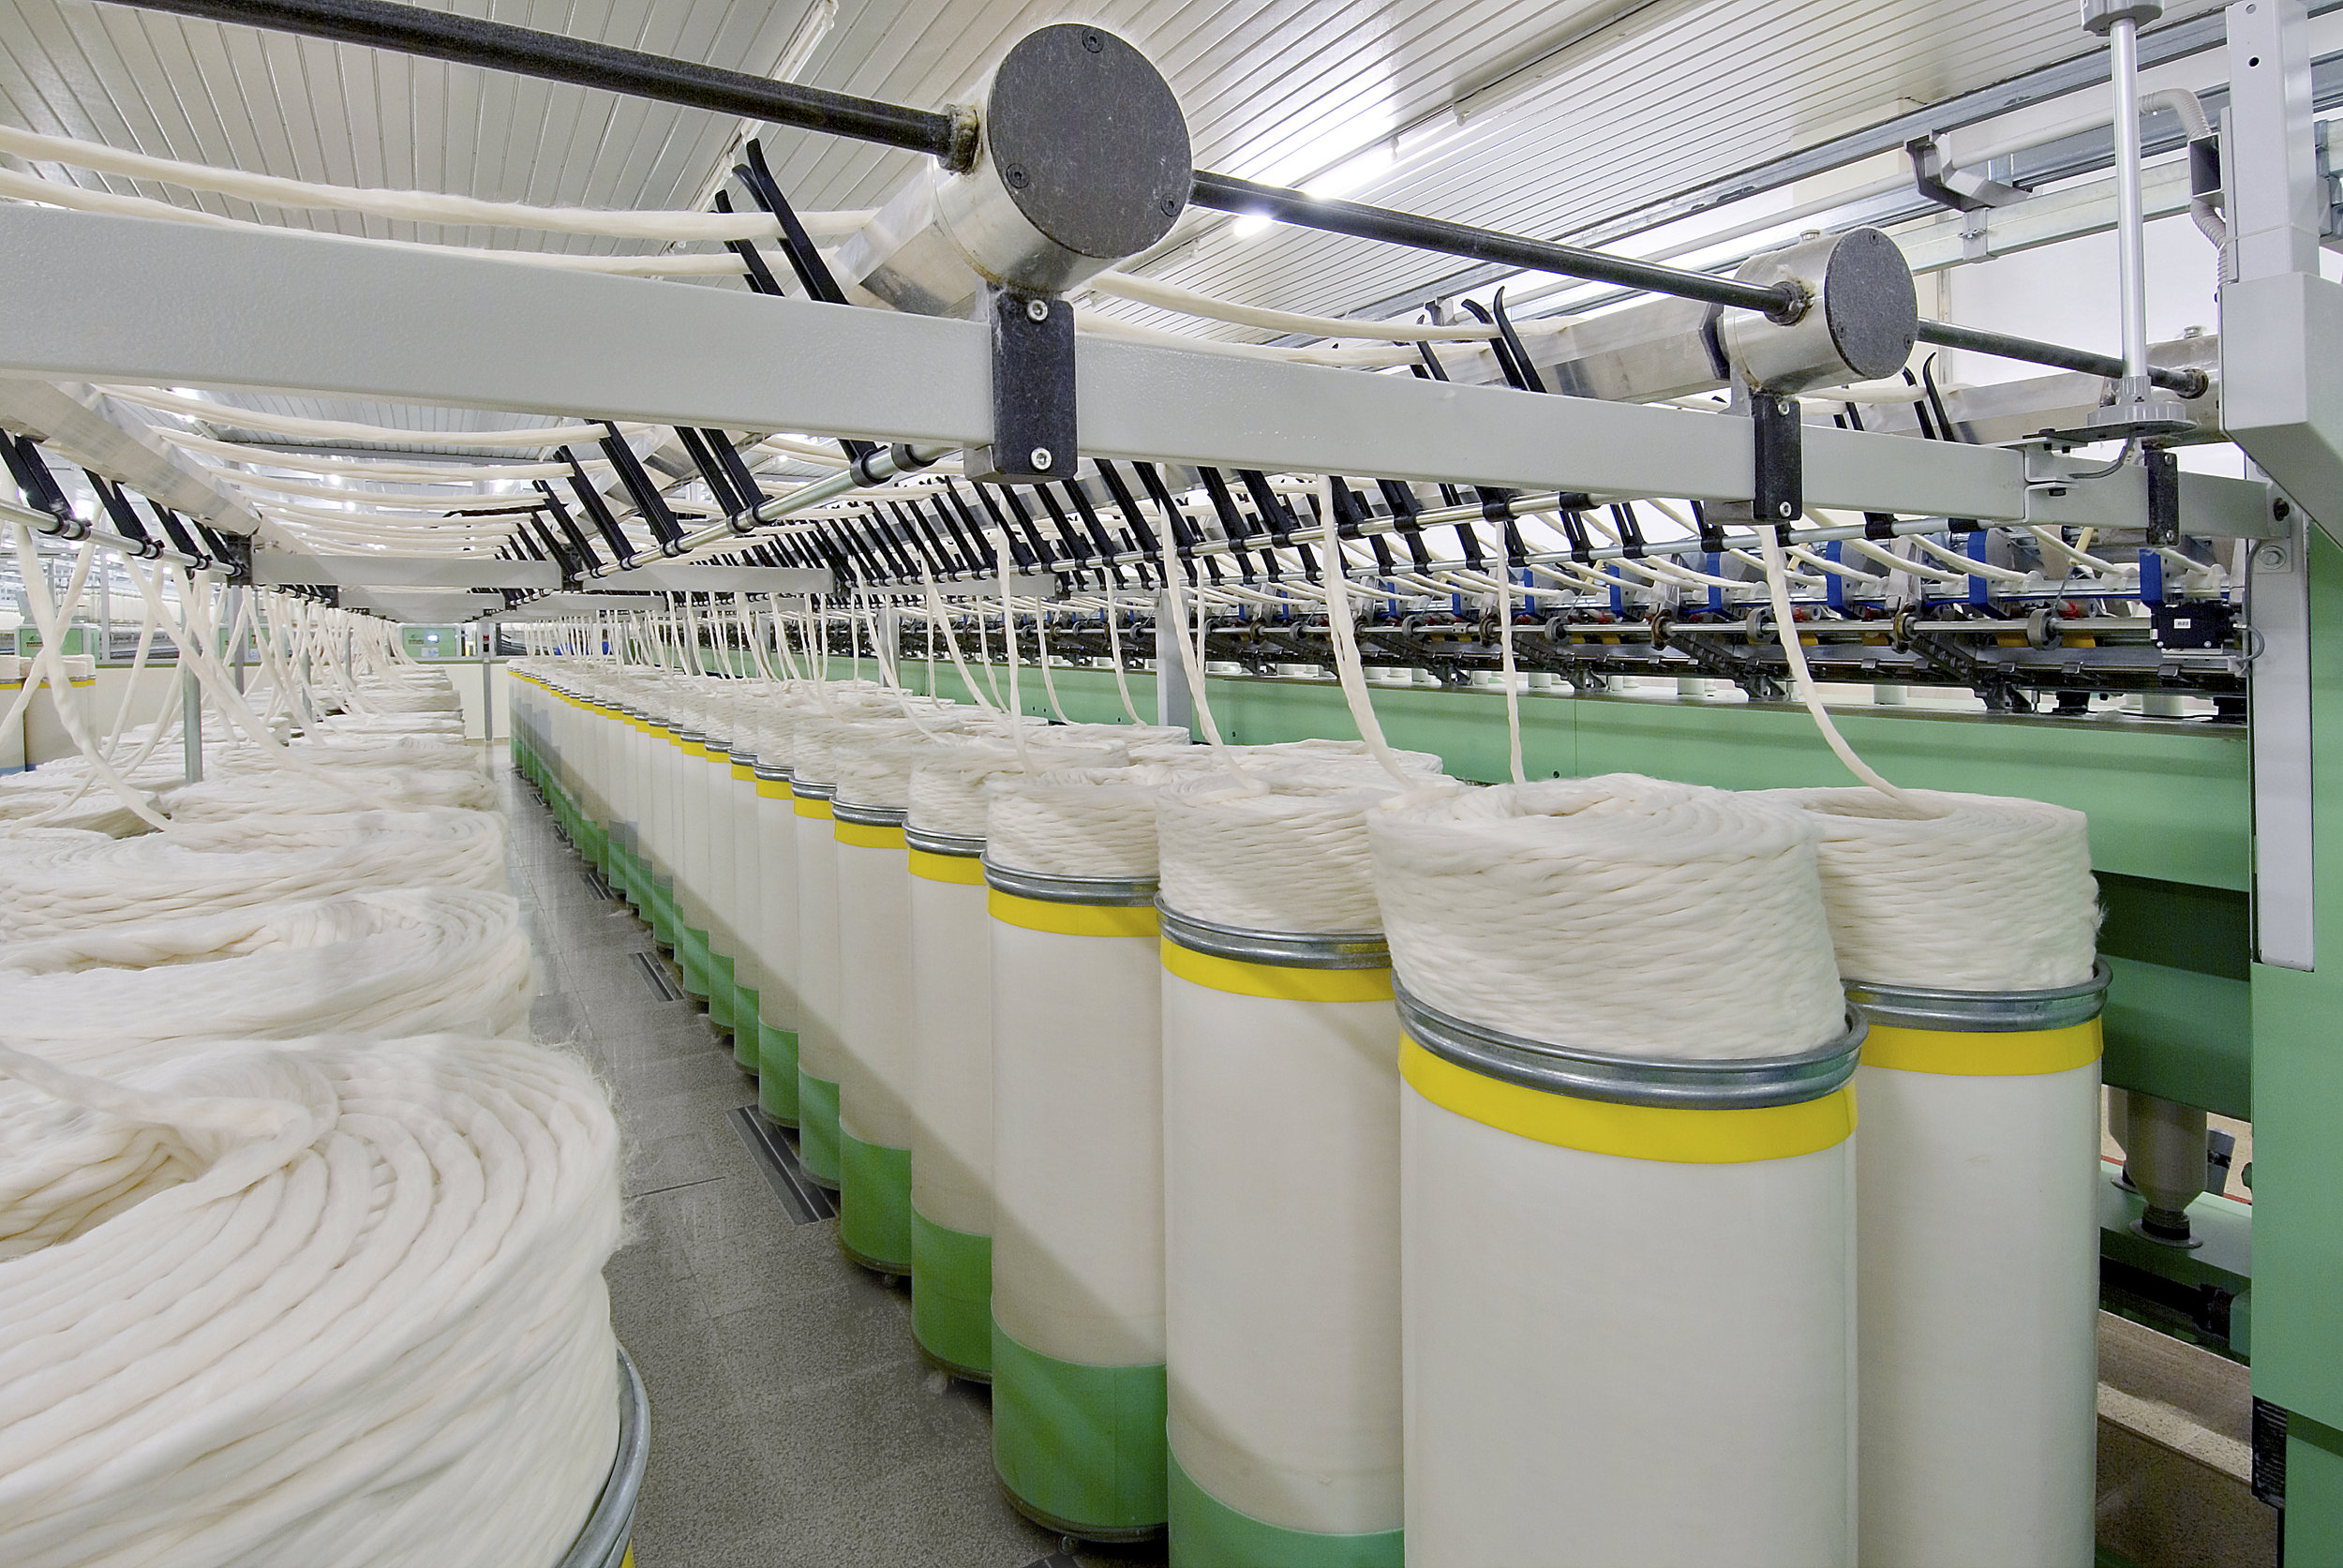 Preparing cotton prior to spinning